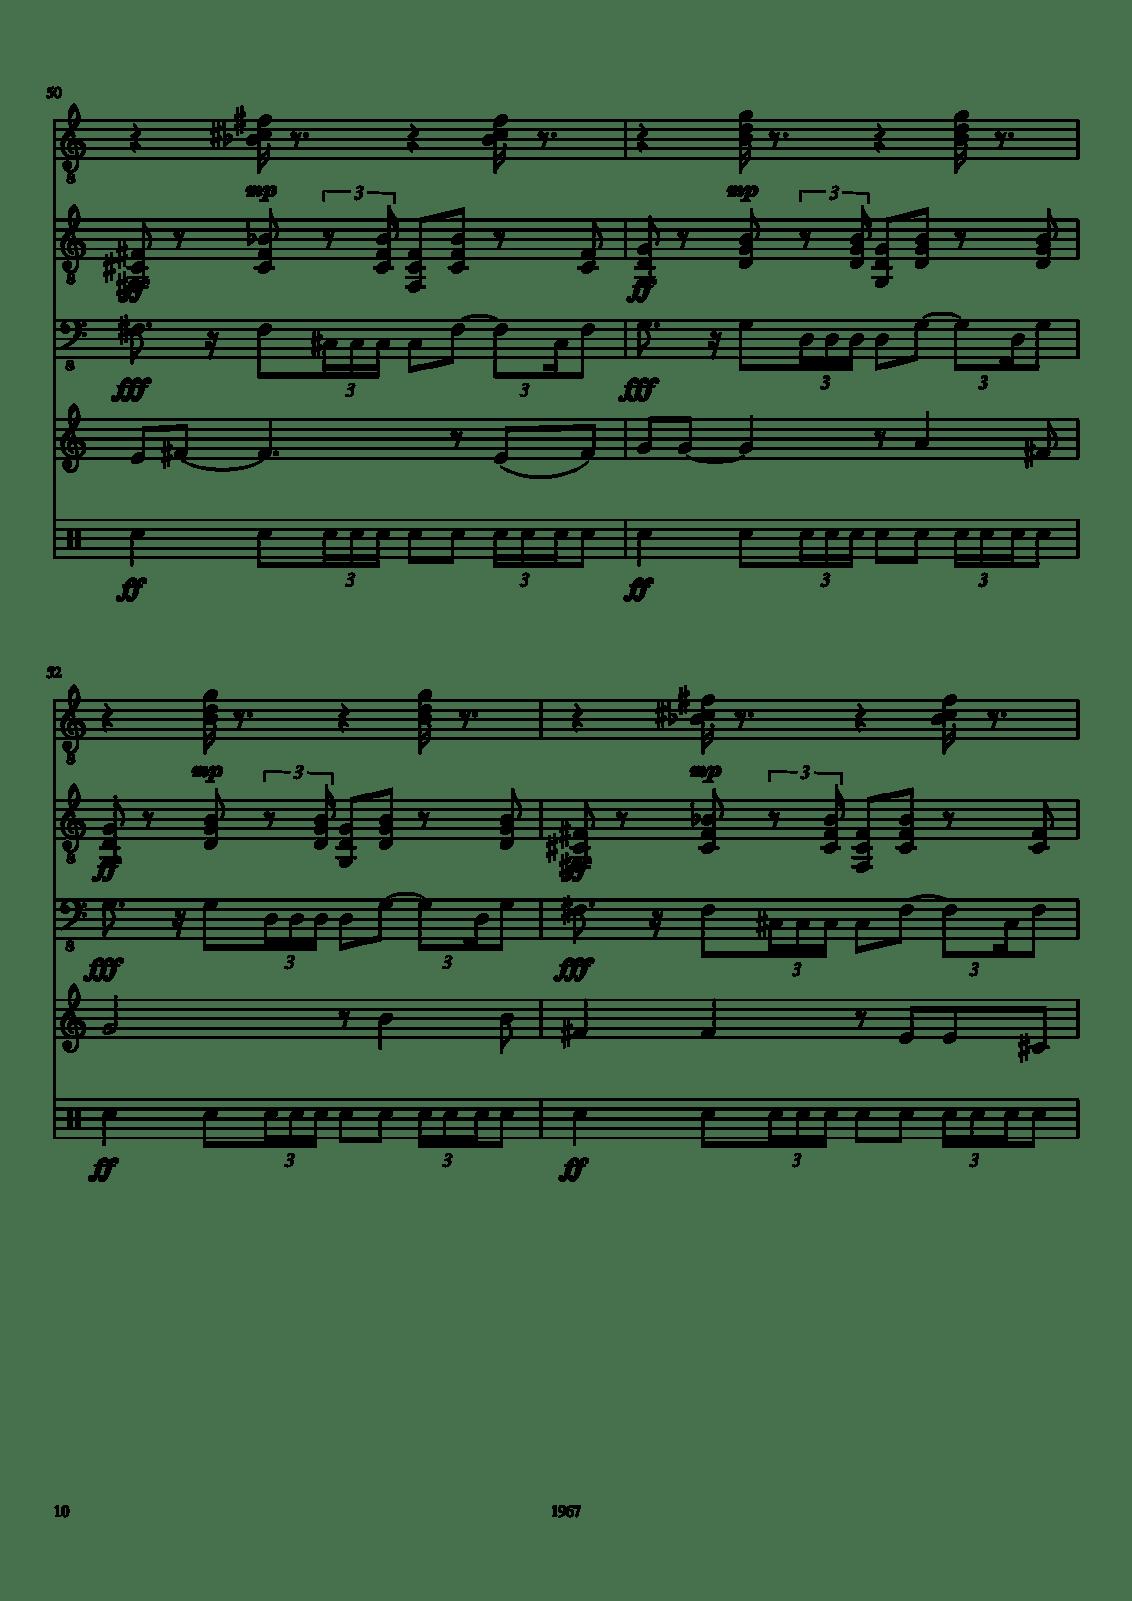 Free Sheet Music White Rabbit By Jefferson Airplane